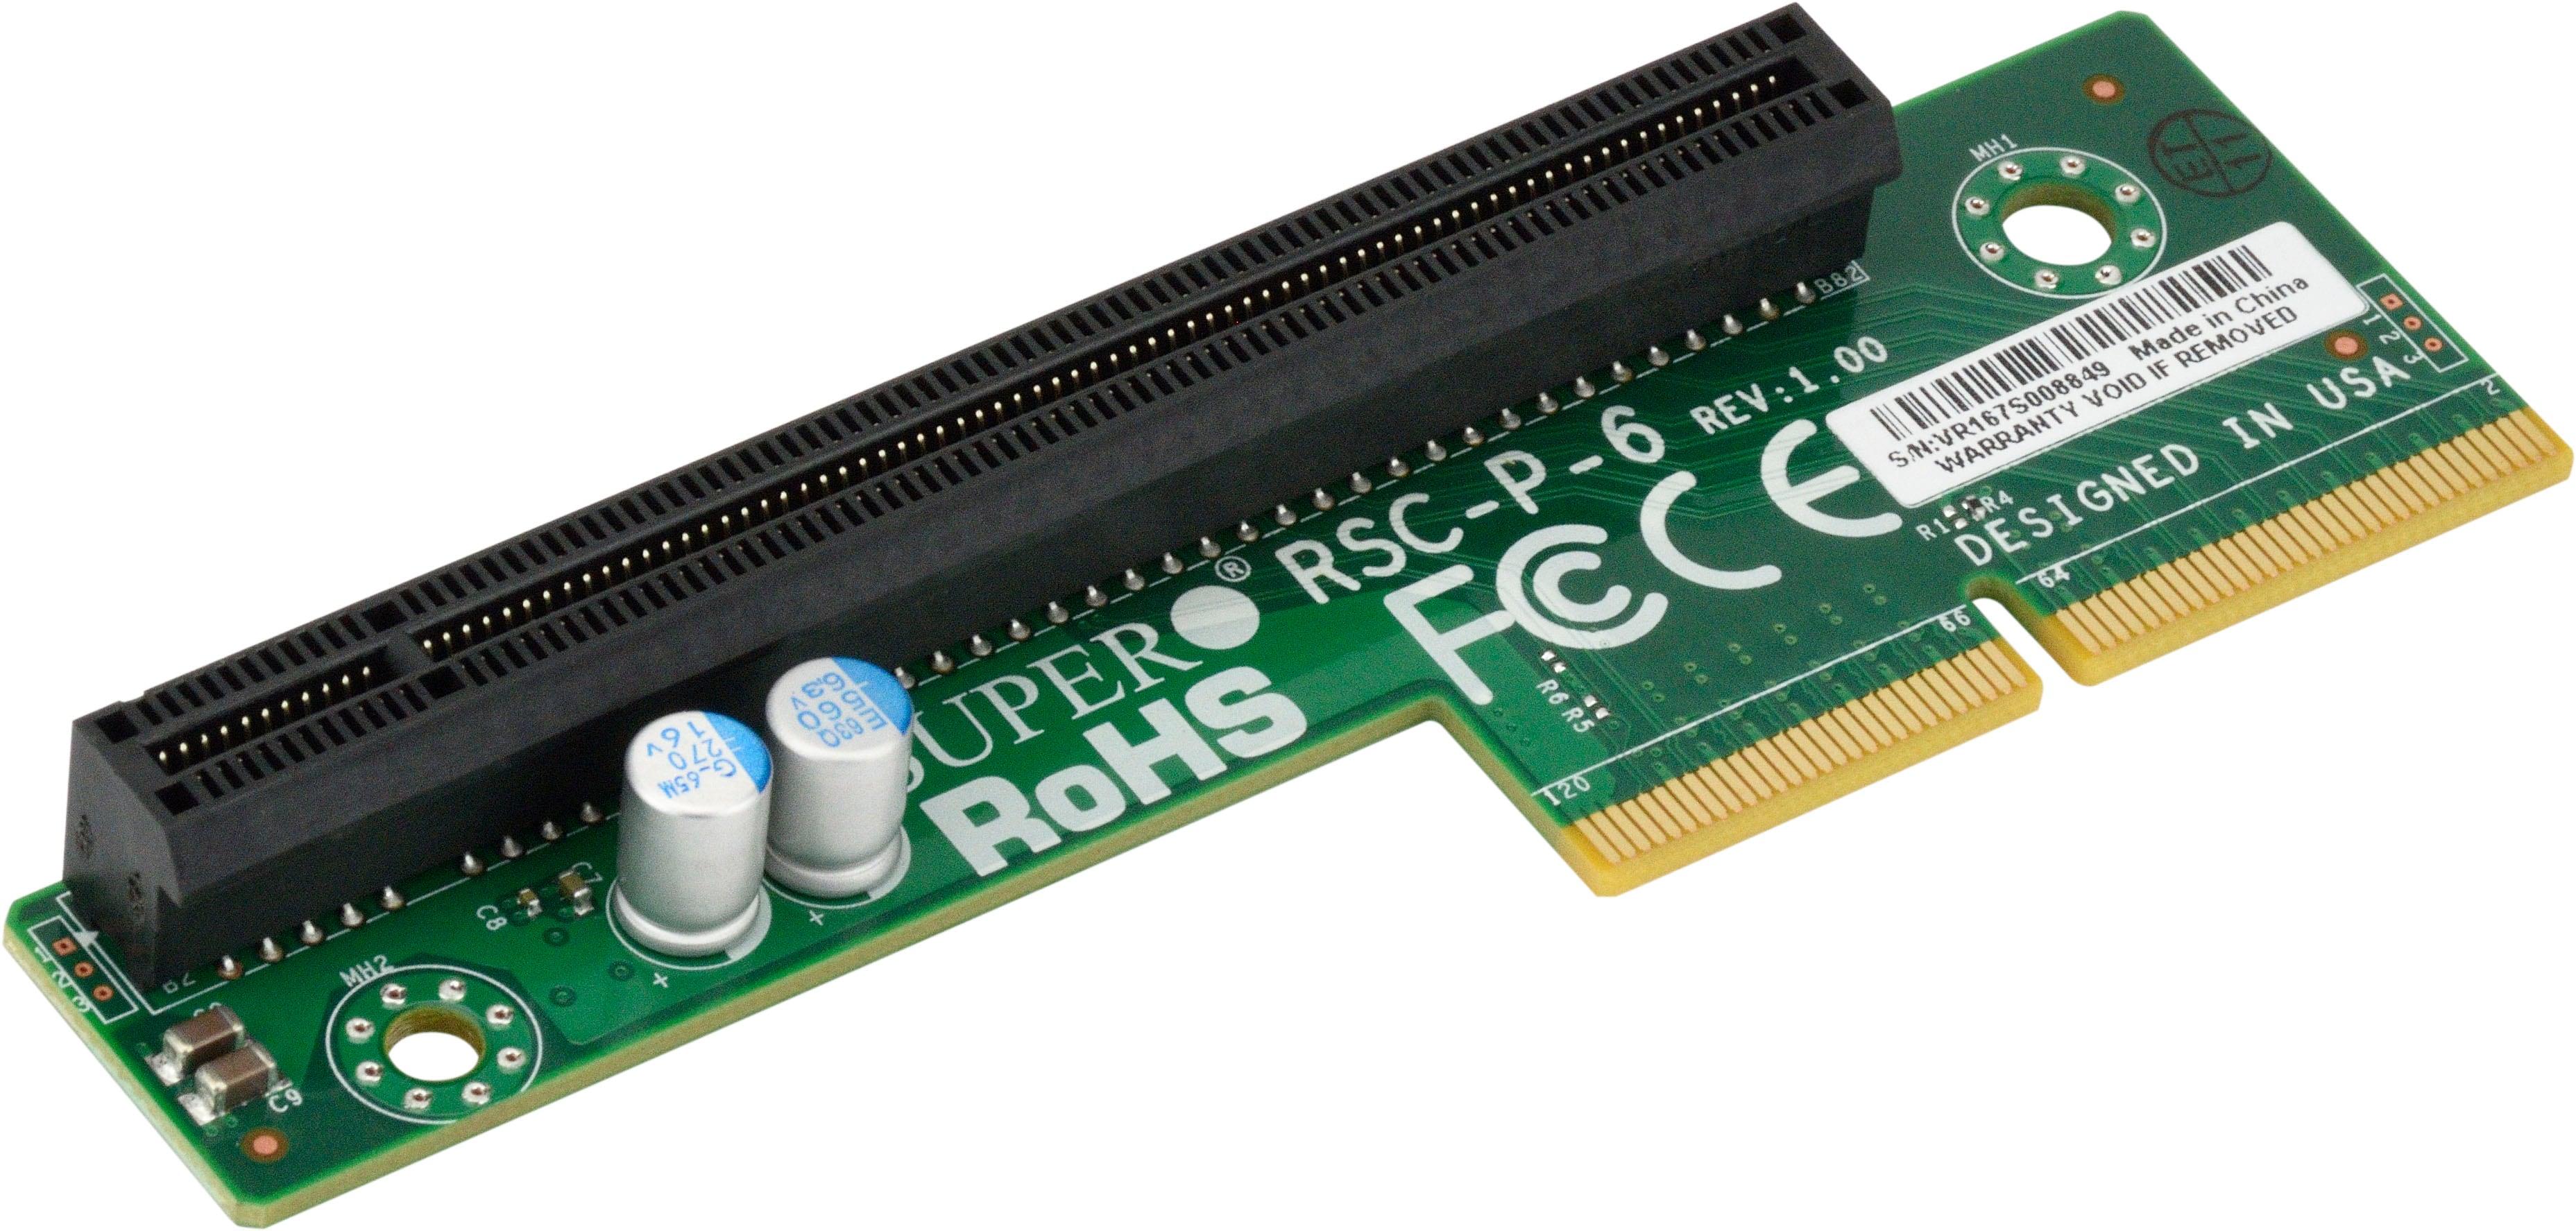 Zdjecie - RSC-P-6 - Supermicro